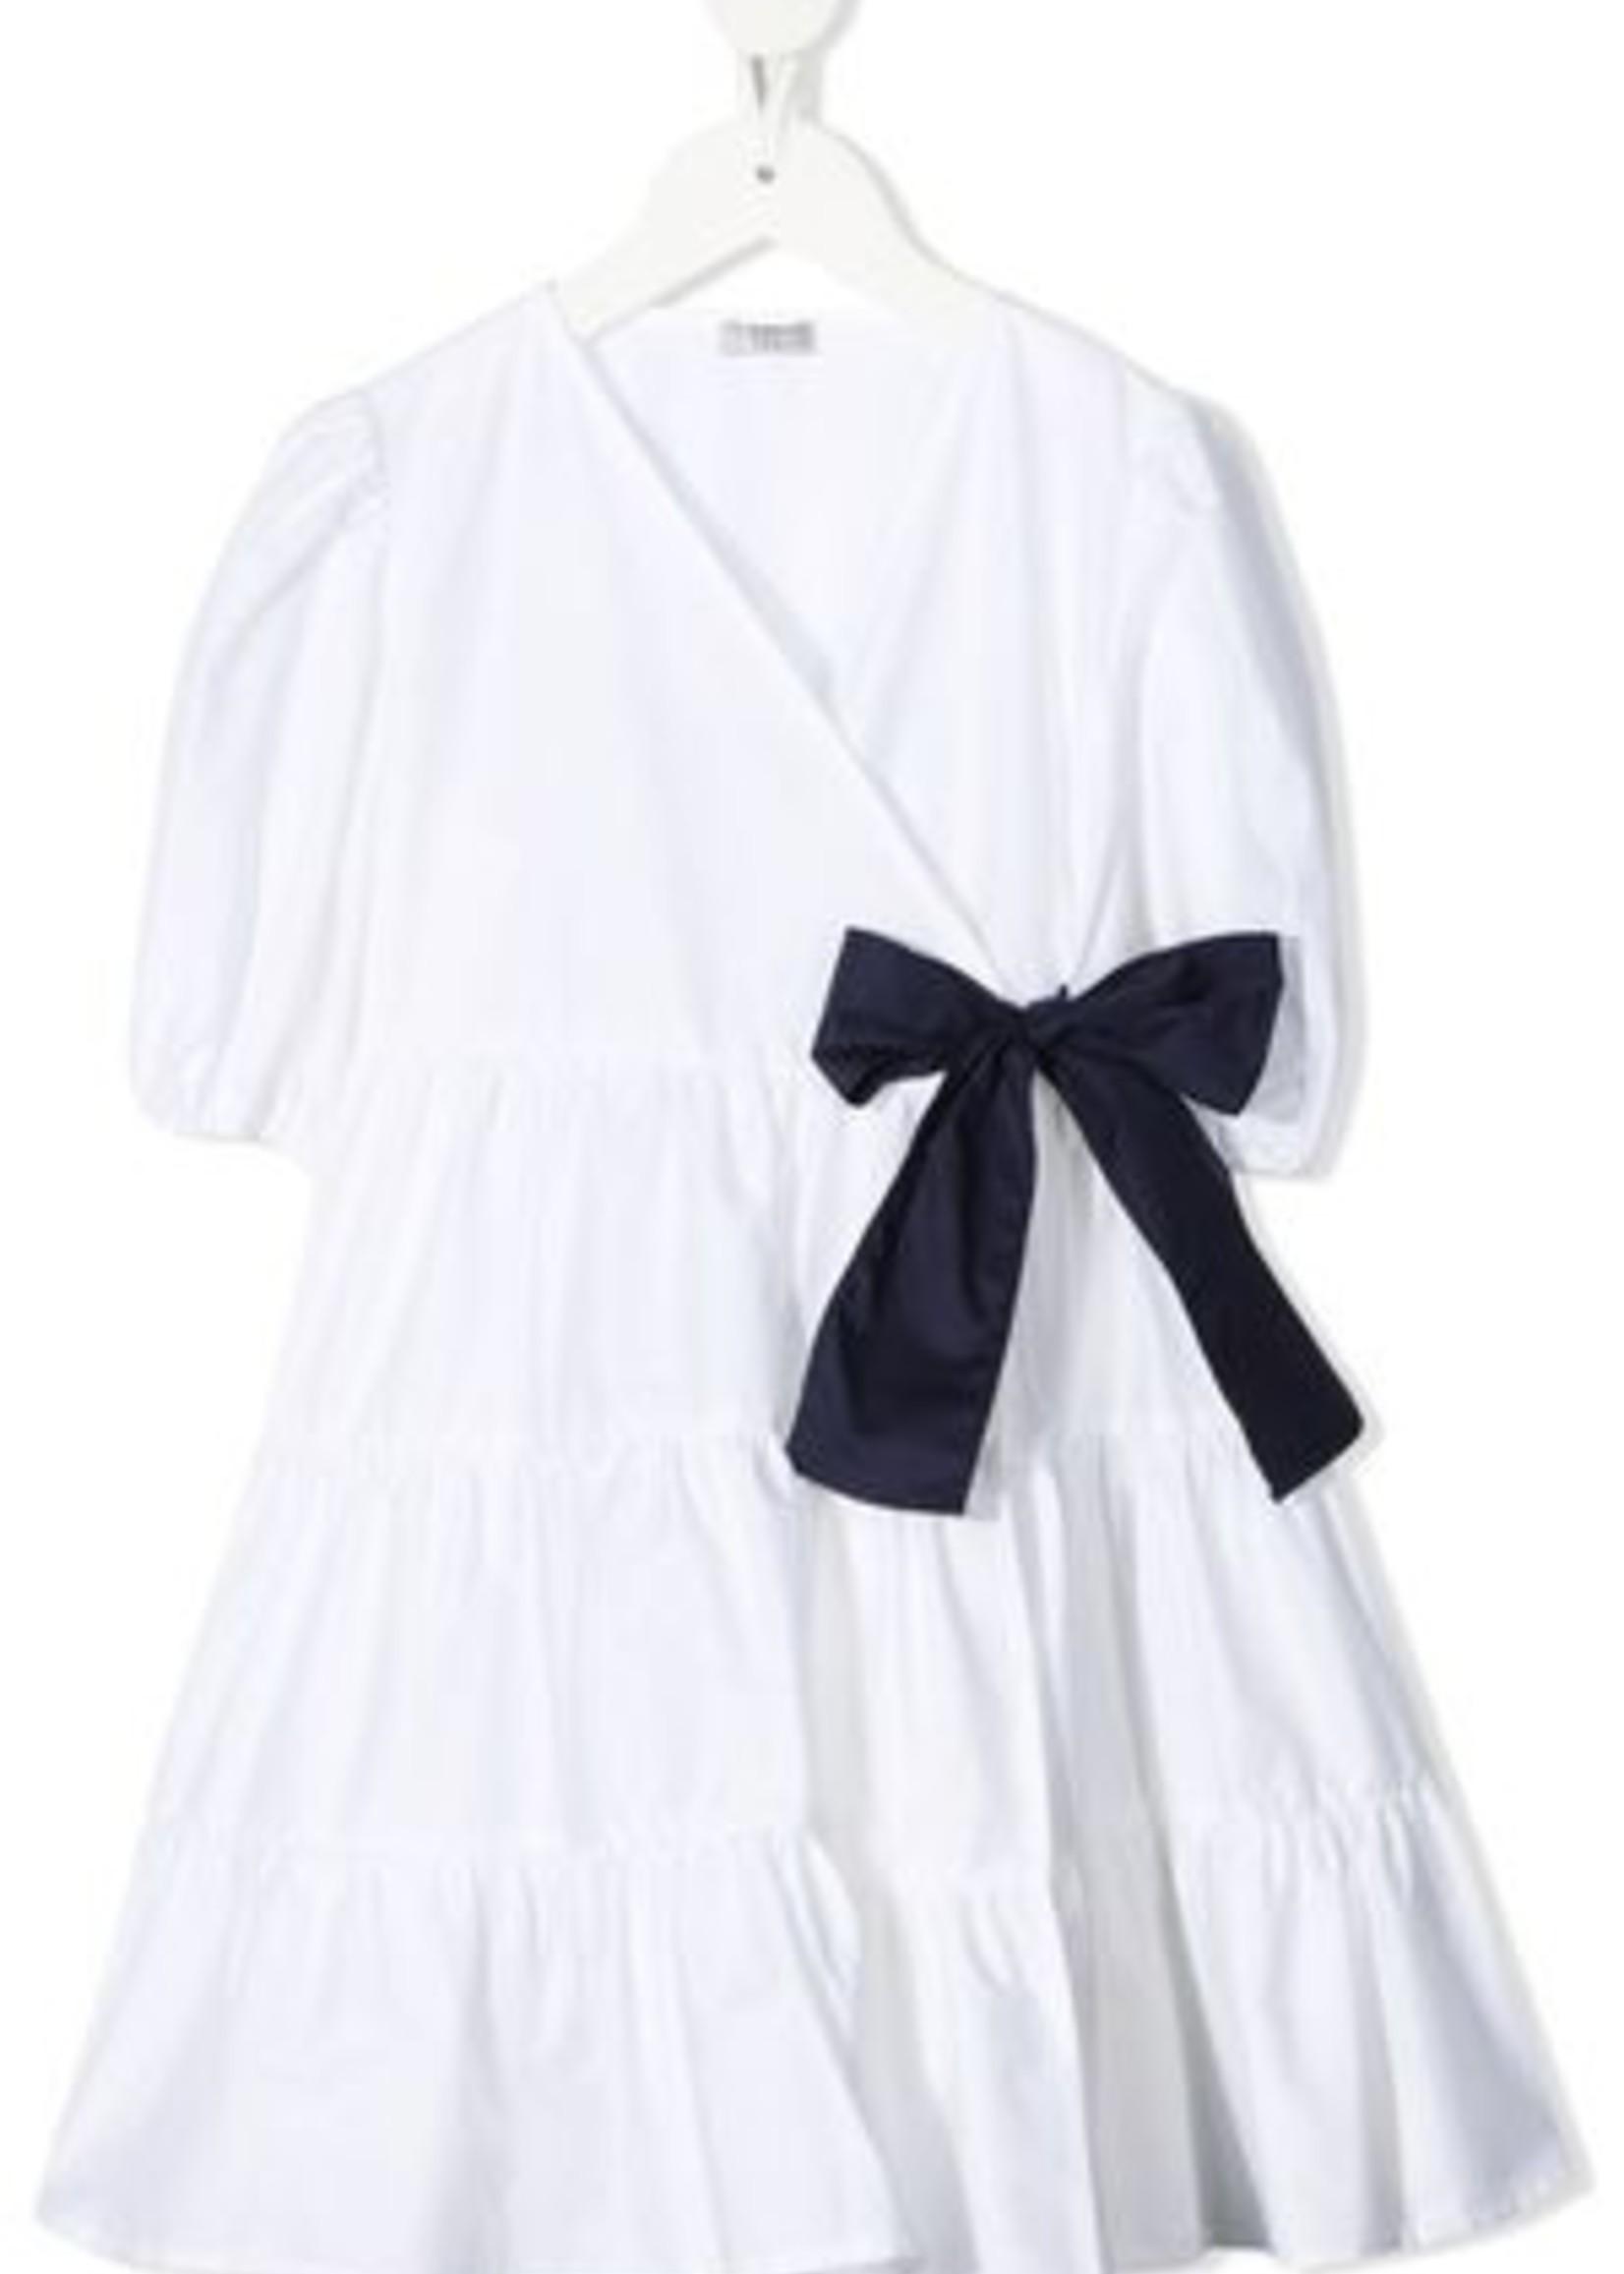 Il Gufo Il Gufo-ss21 SHORT SLEEVE DRESS WITH CROSSOVER CLOSURE